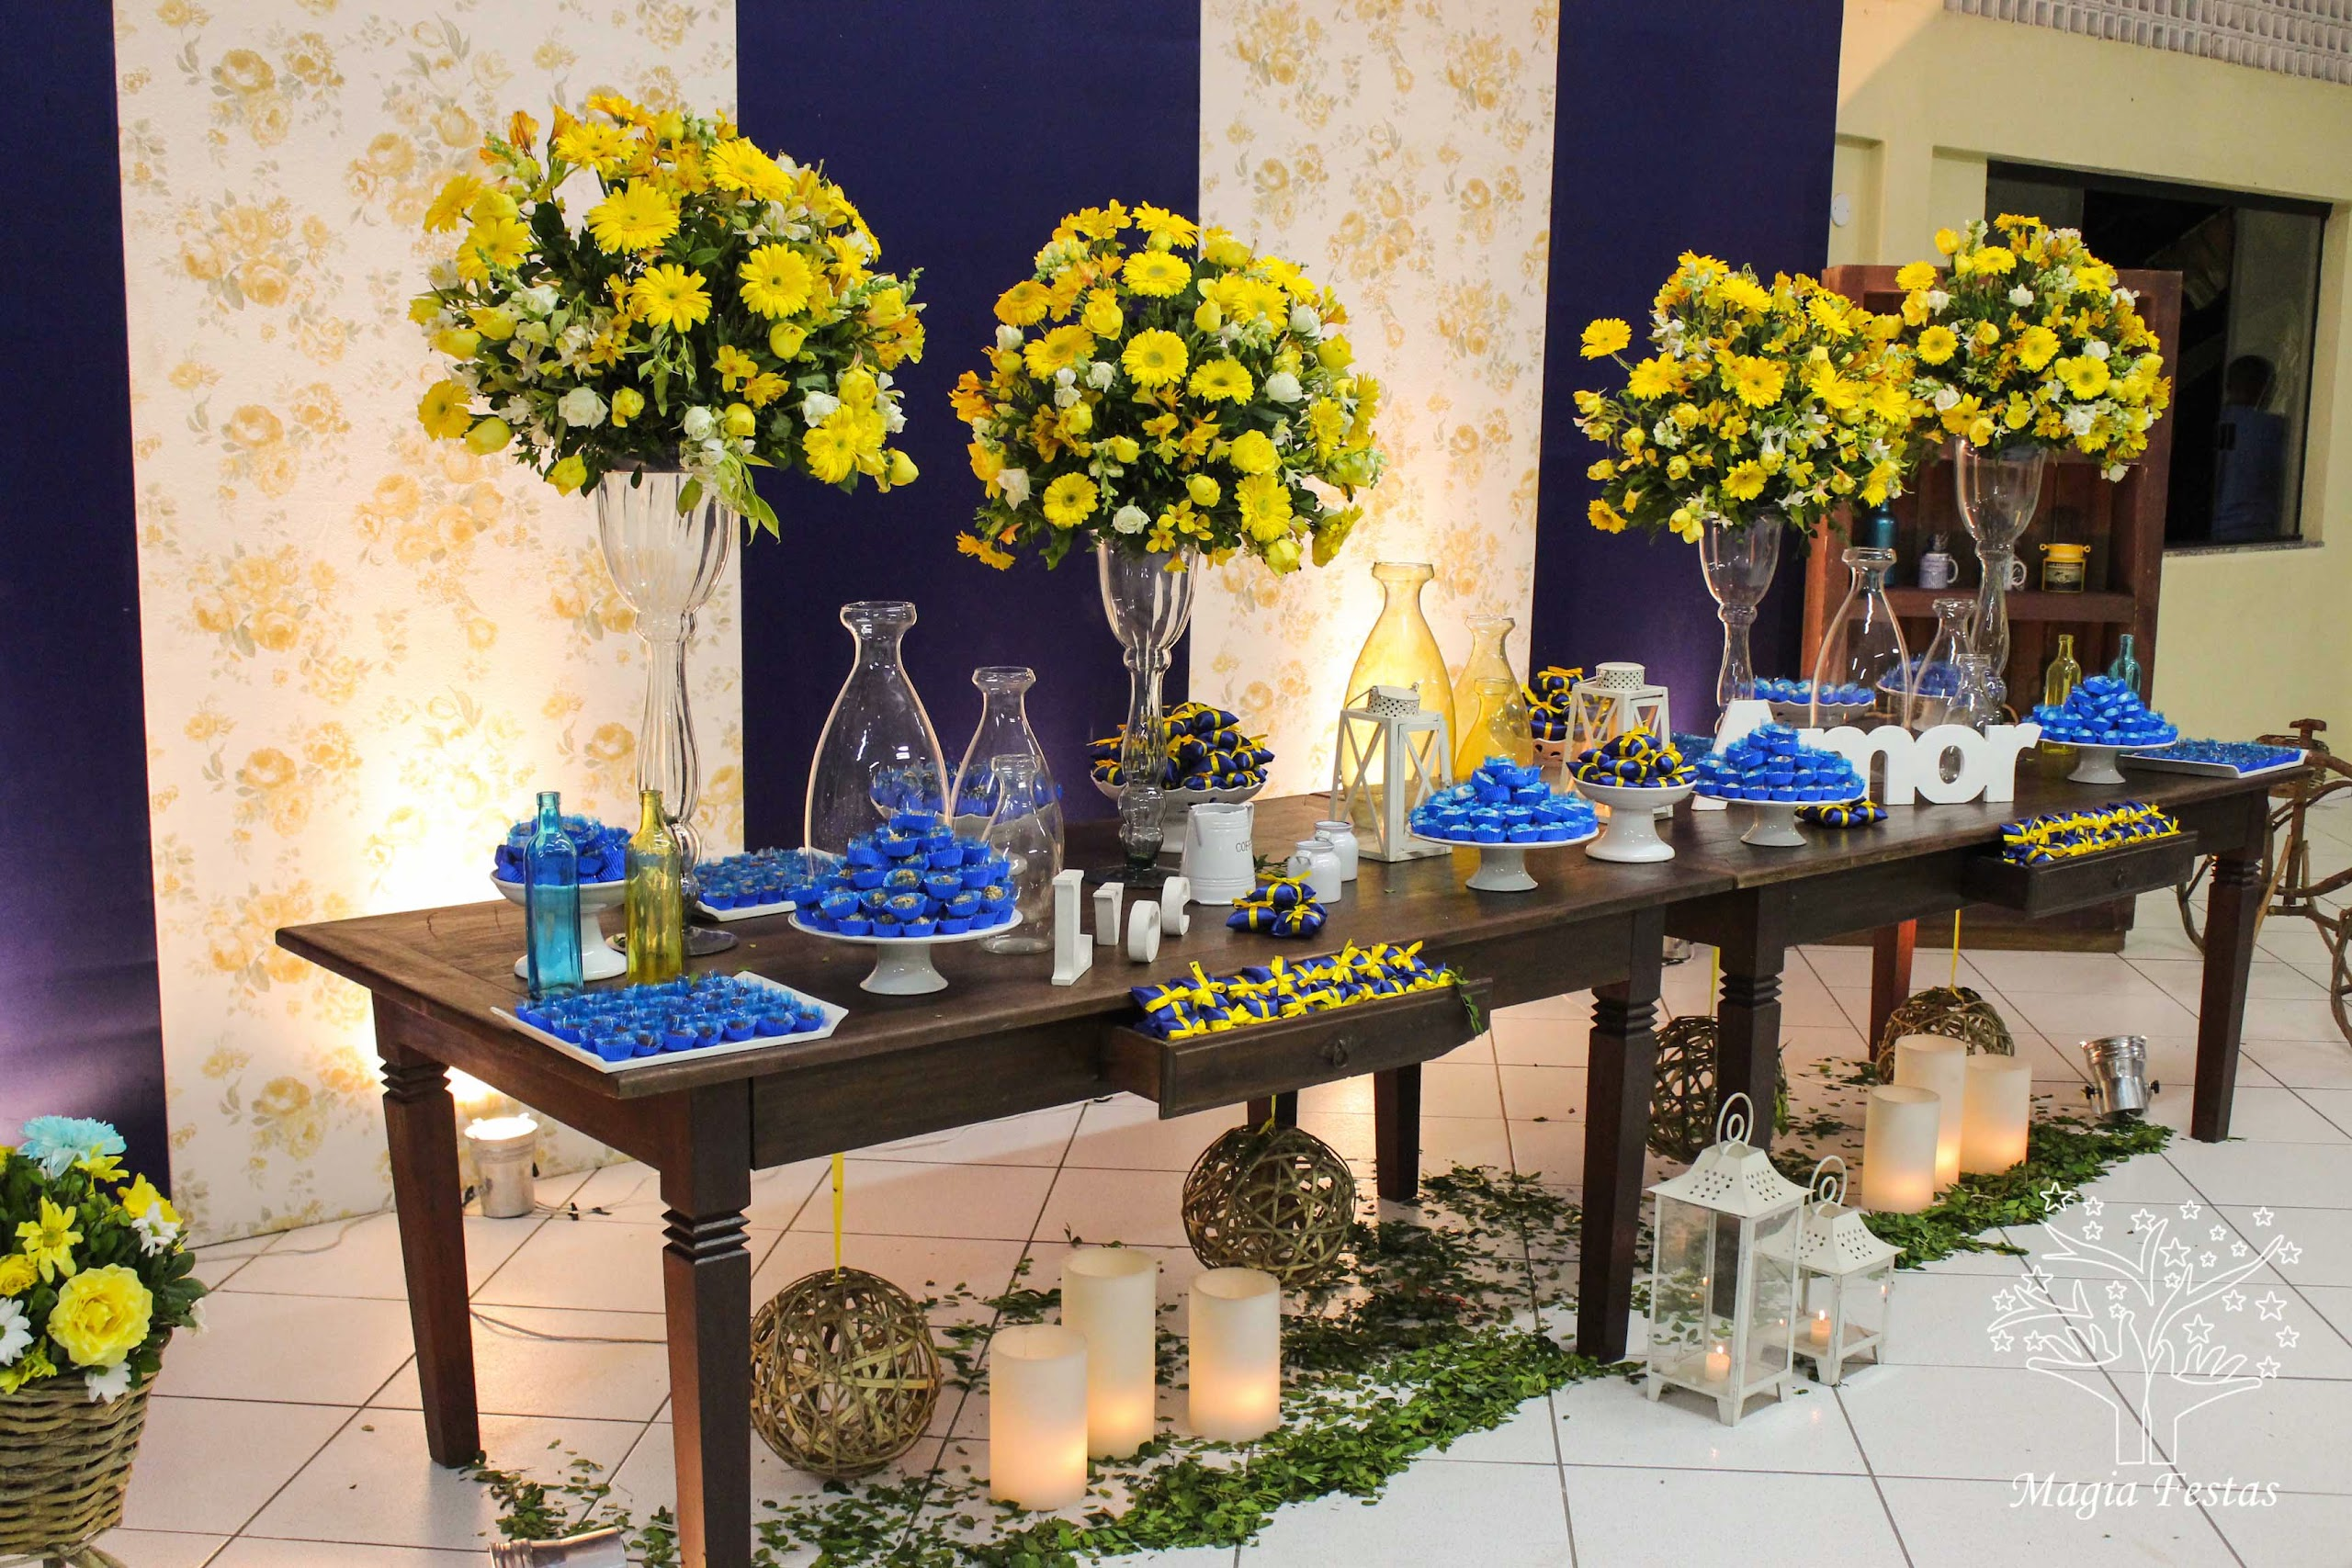 decoracao de casamento na igreja azul e amarelo:quinta-feira, 29 de maio de 2014